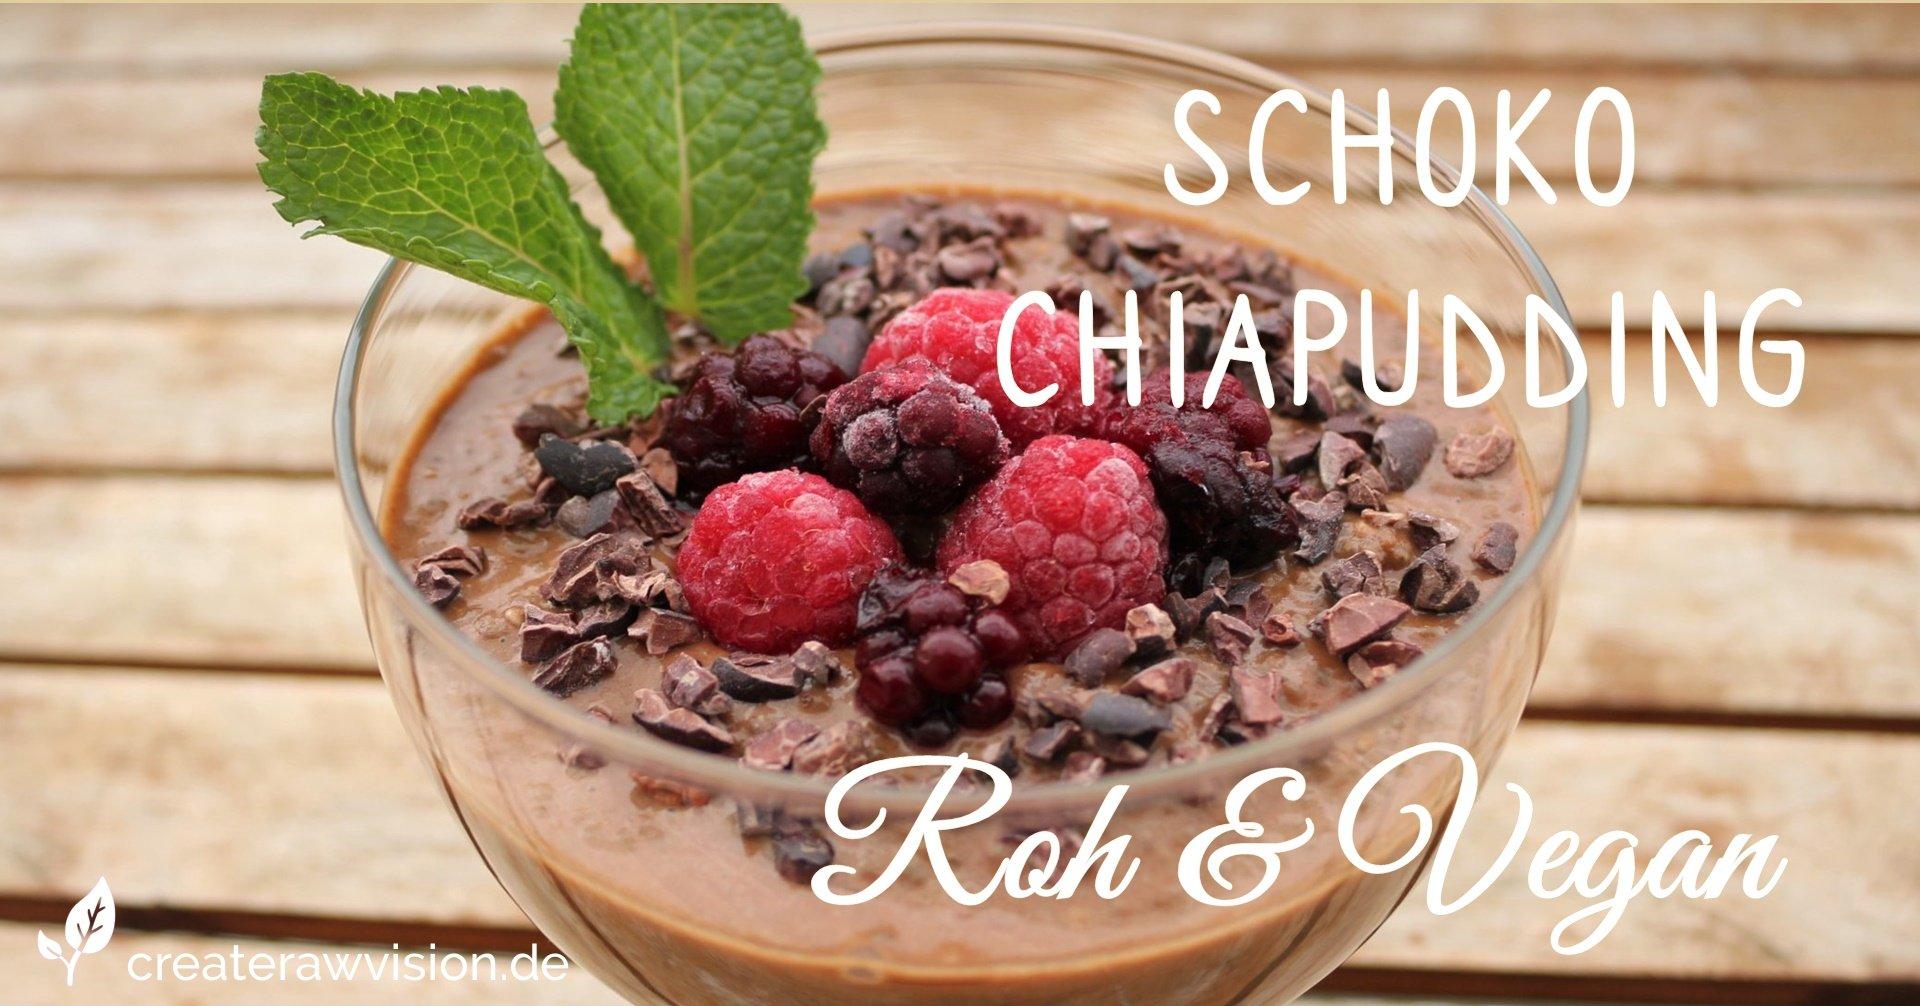 Schoko-Chia-Pudding Roh & Vegan